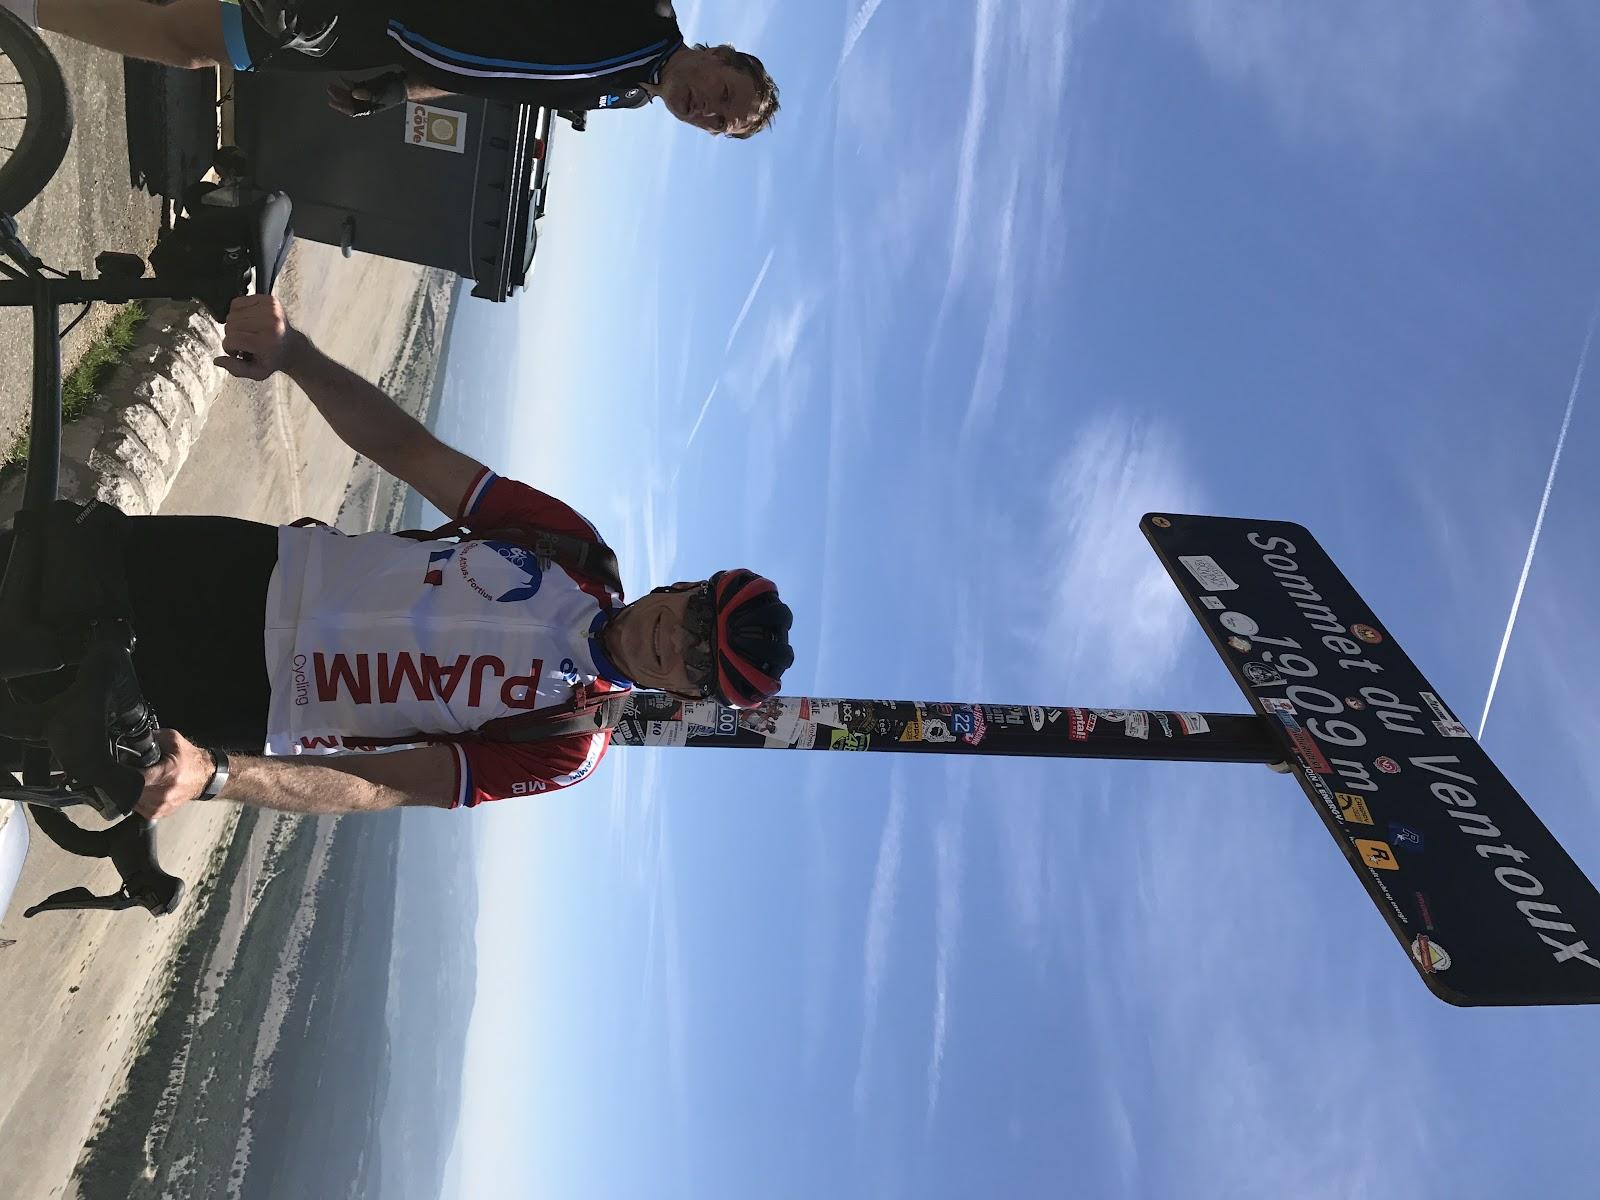 Bike Climb Mont Ventoux - John Johnson PJAMM Cycling with bike at summit sign